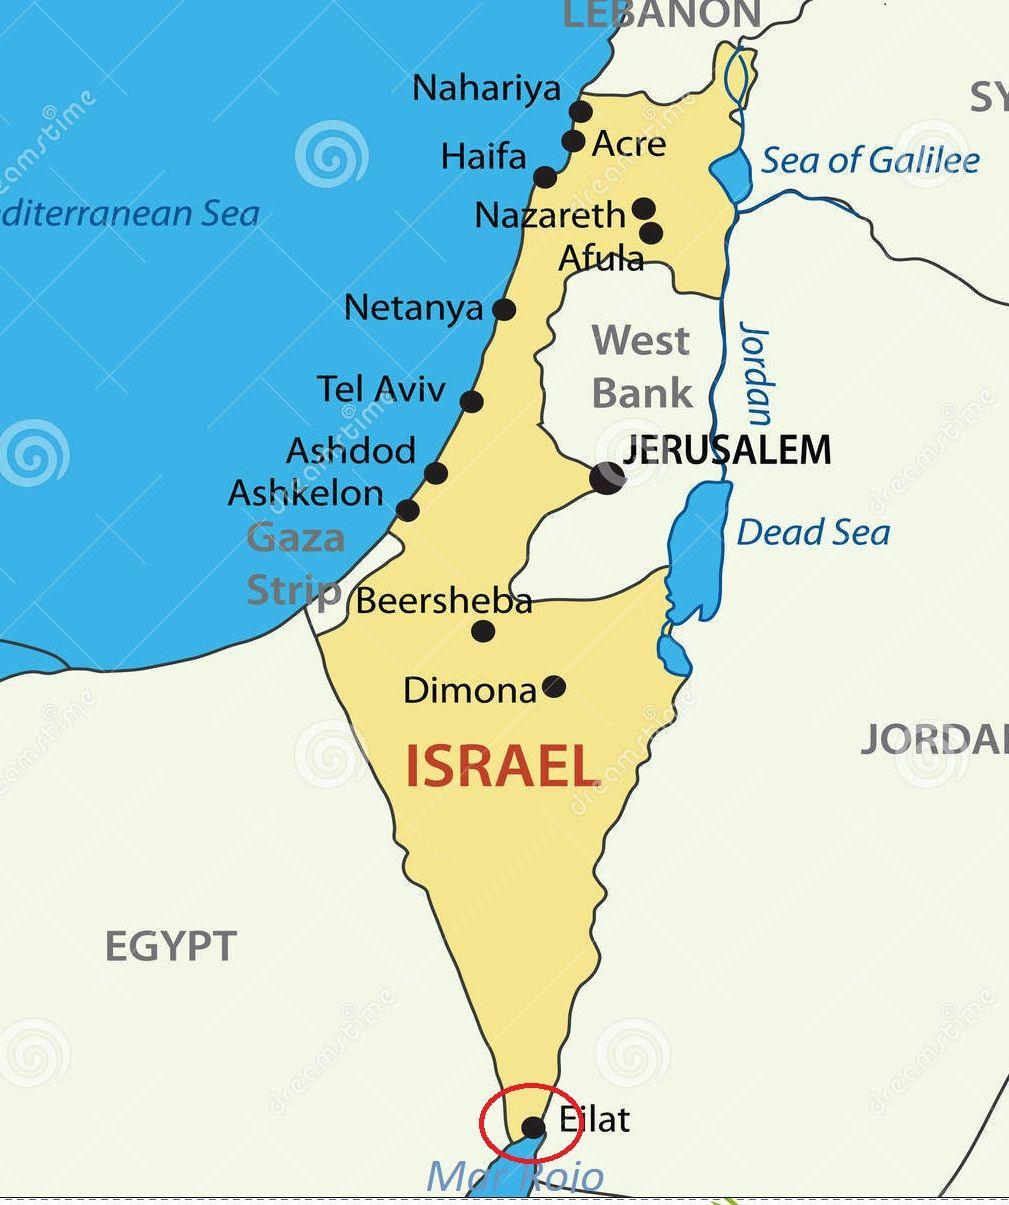 Ubicacin Geogrfica de Eilat Turismo en Eilat Israel Pinterest